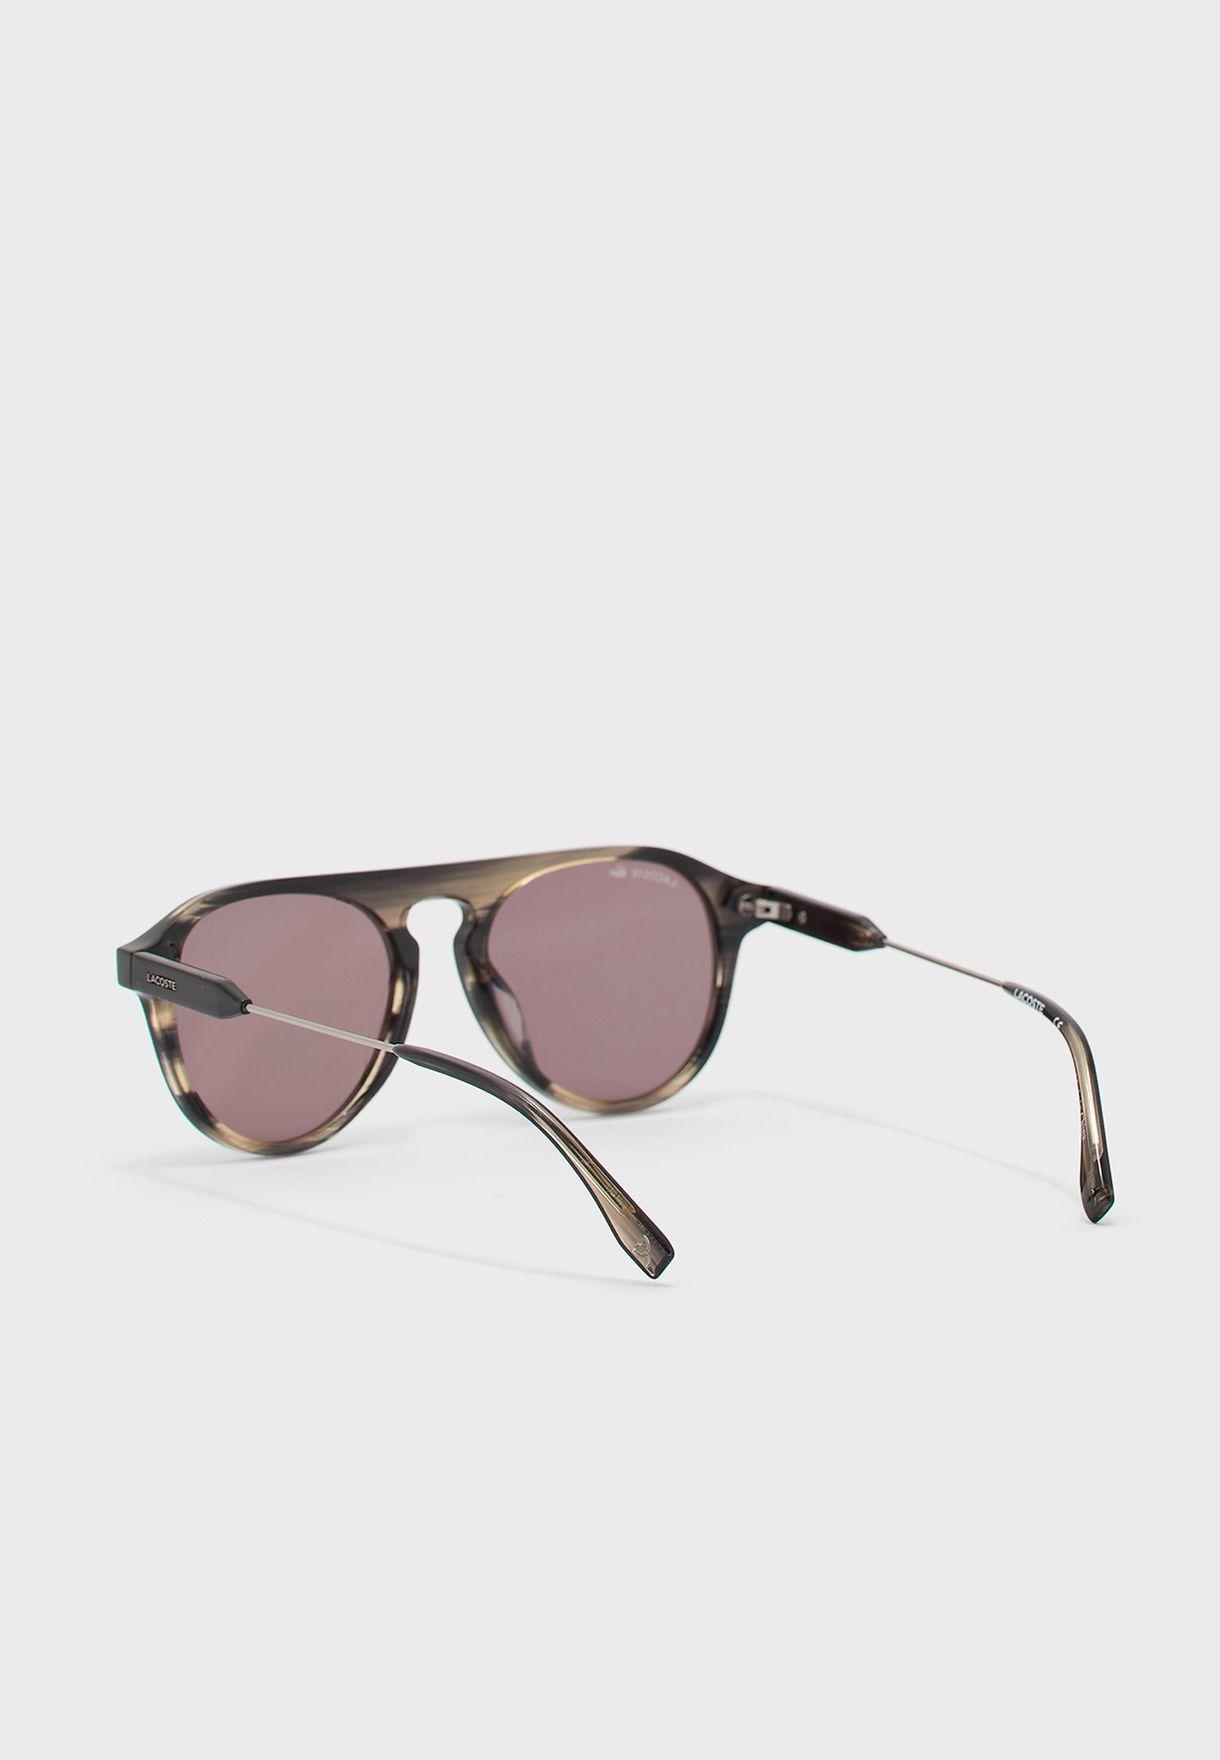 L603Snd Oval Shape Sunglasses